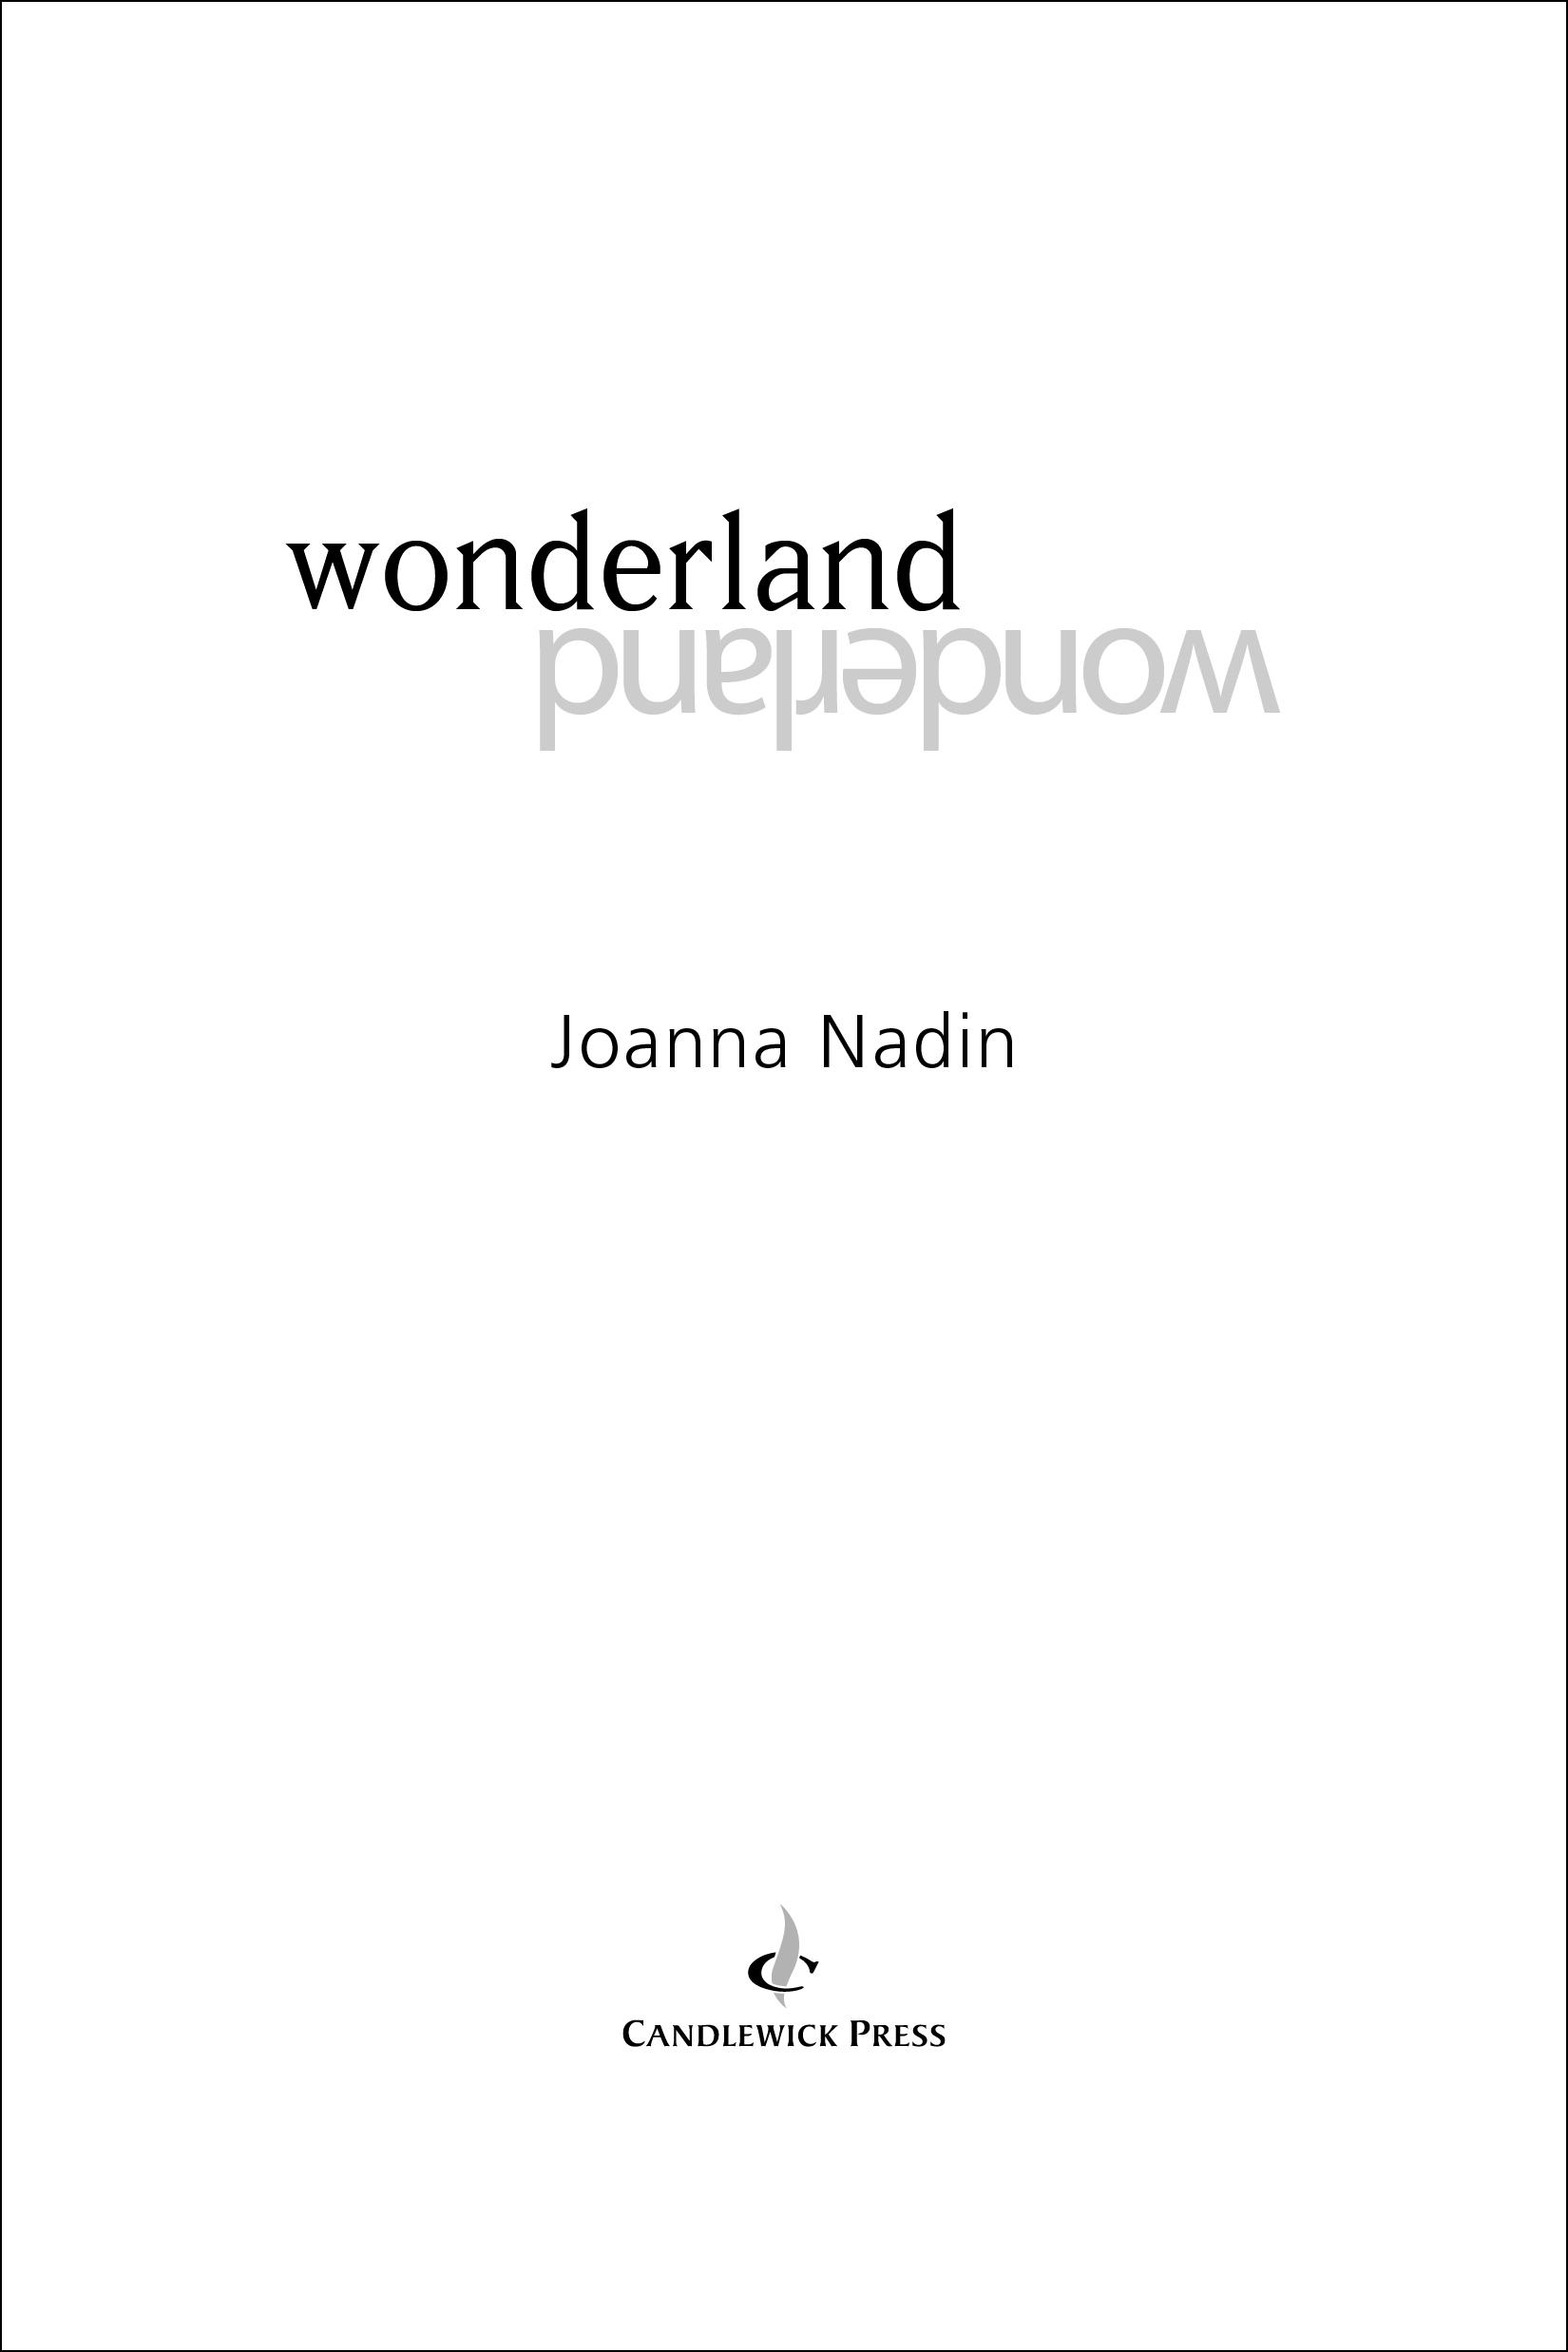 Title page for WONDERLAND